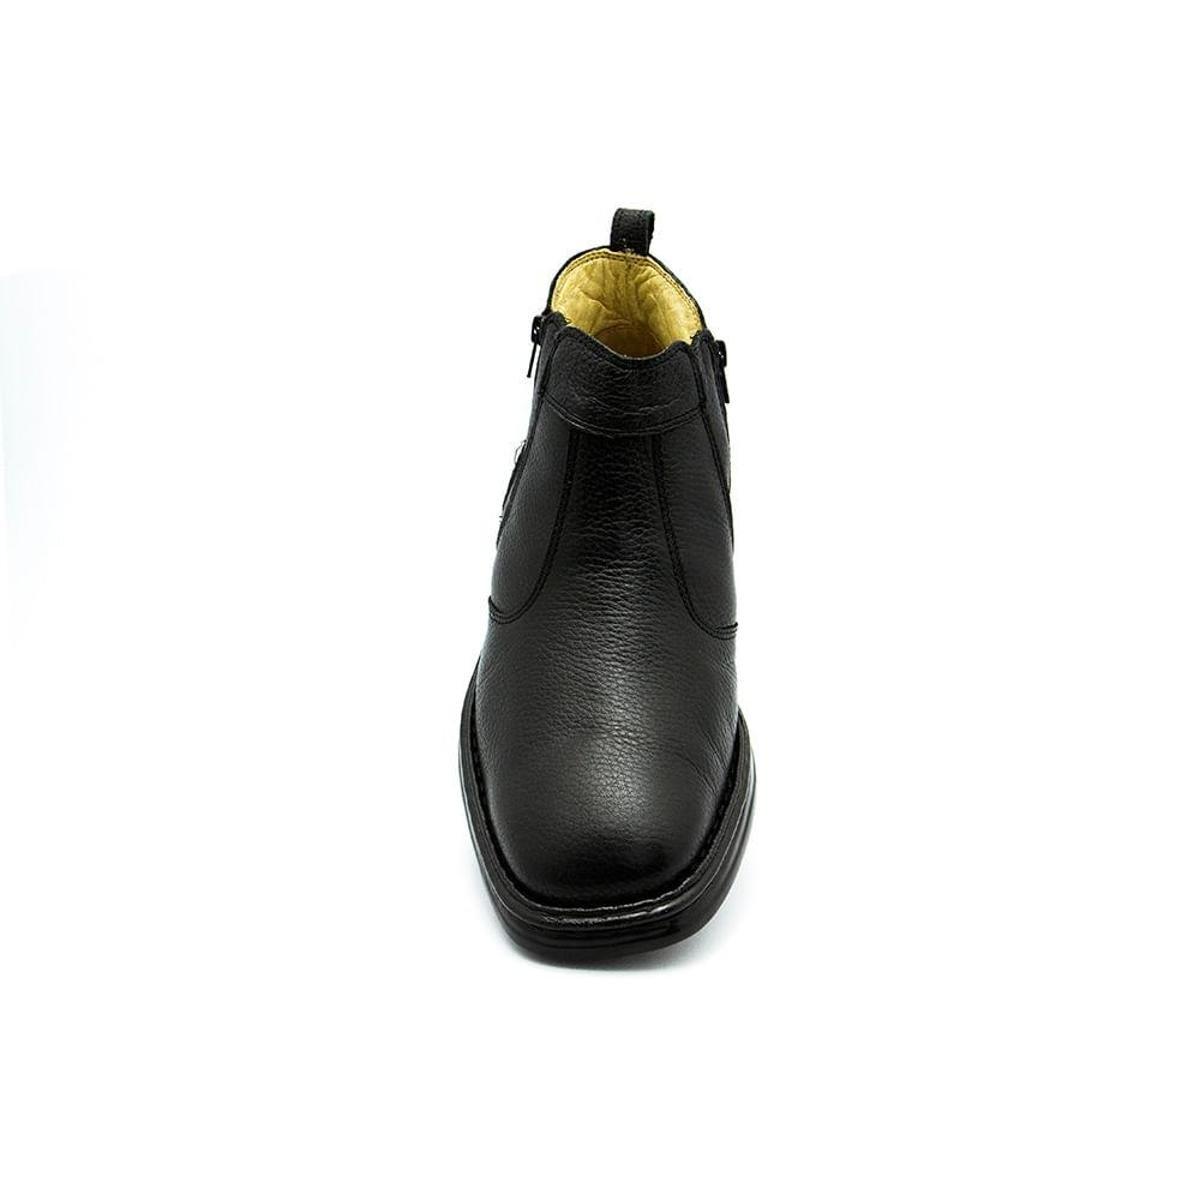 Doctor Preto Comfort Bota Shoes Bota Comfort qxUtgBFF